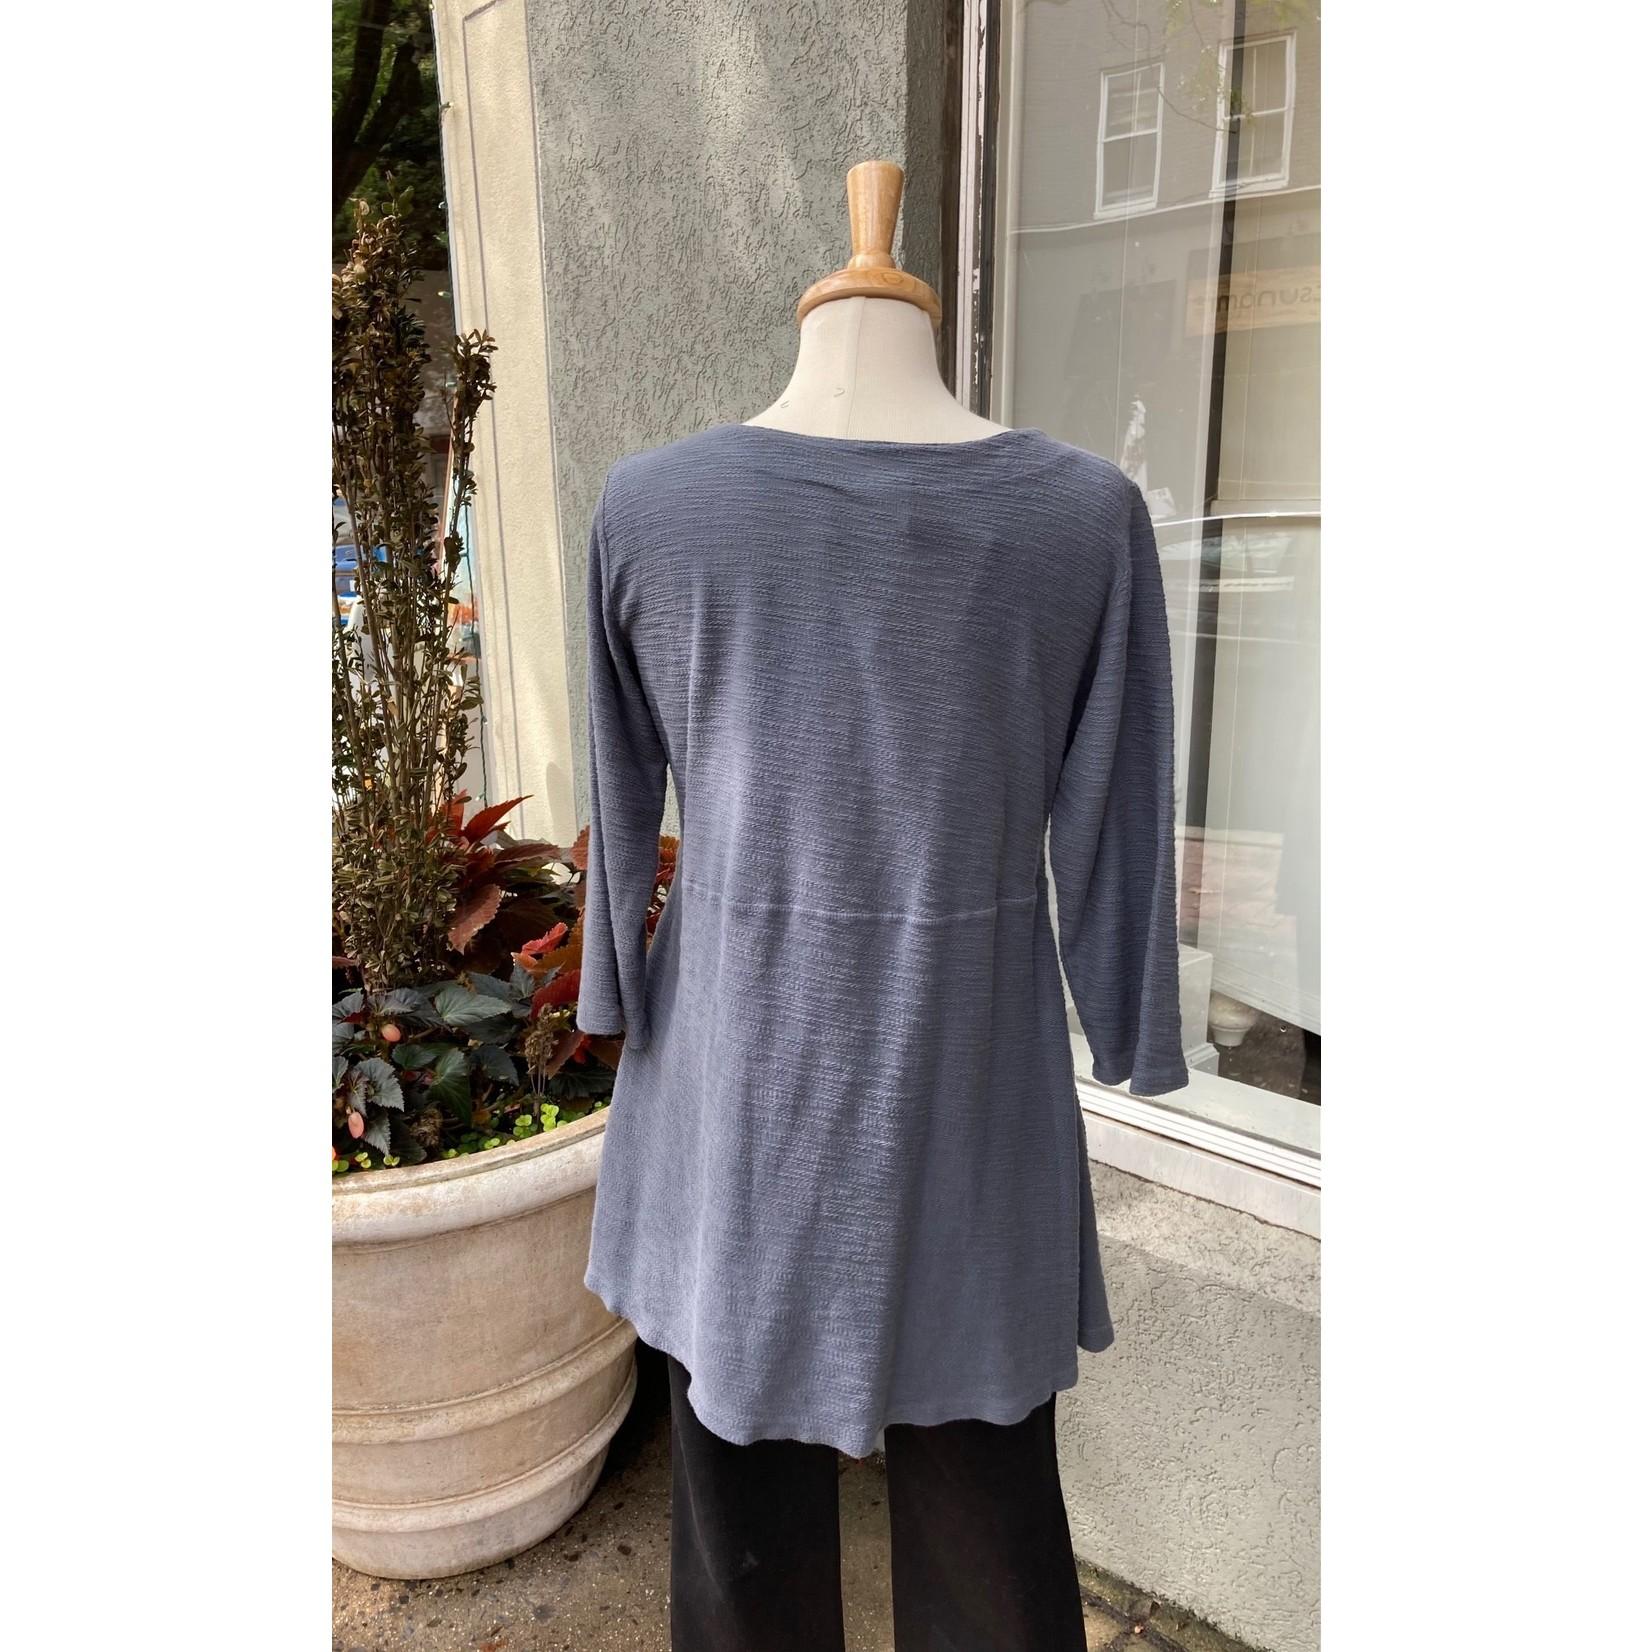 Color Me Cotton Multi-seamed Cover Stitch Swing Tunic in Asphalt